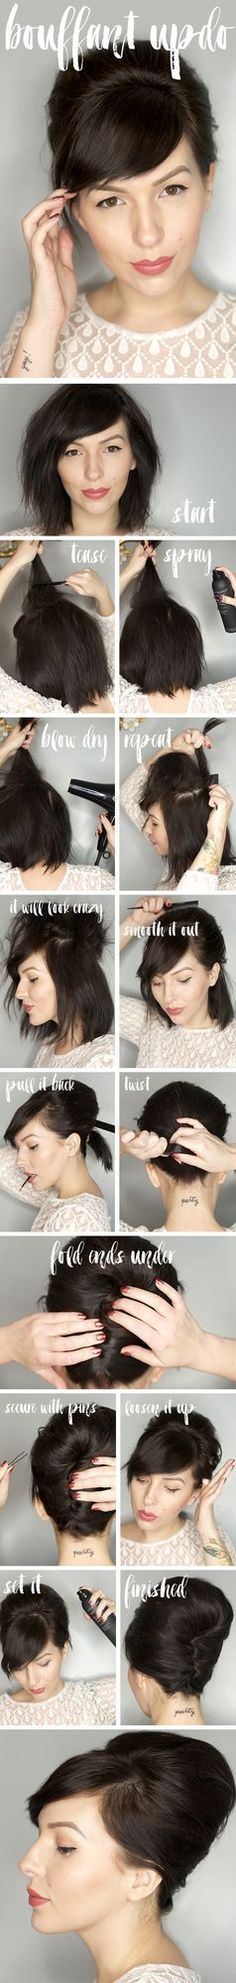 Bouffant Updo Hair Tutorial (keiko lynn)